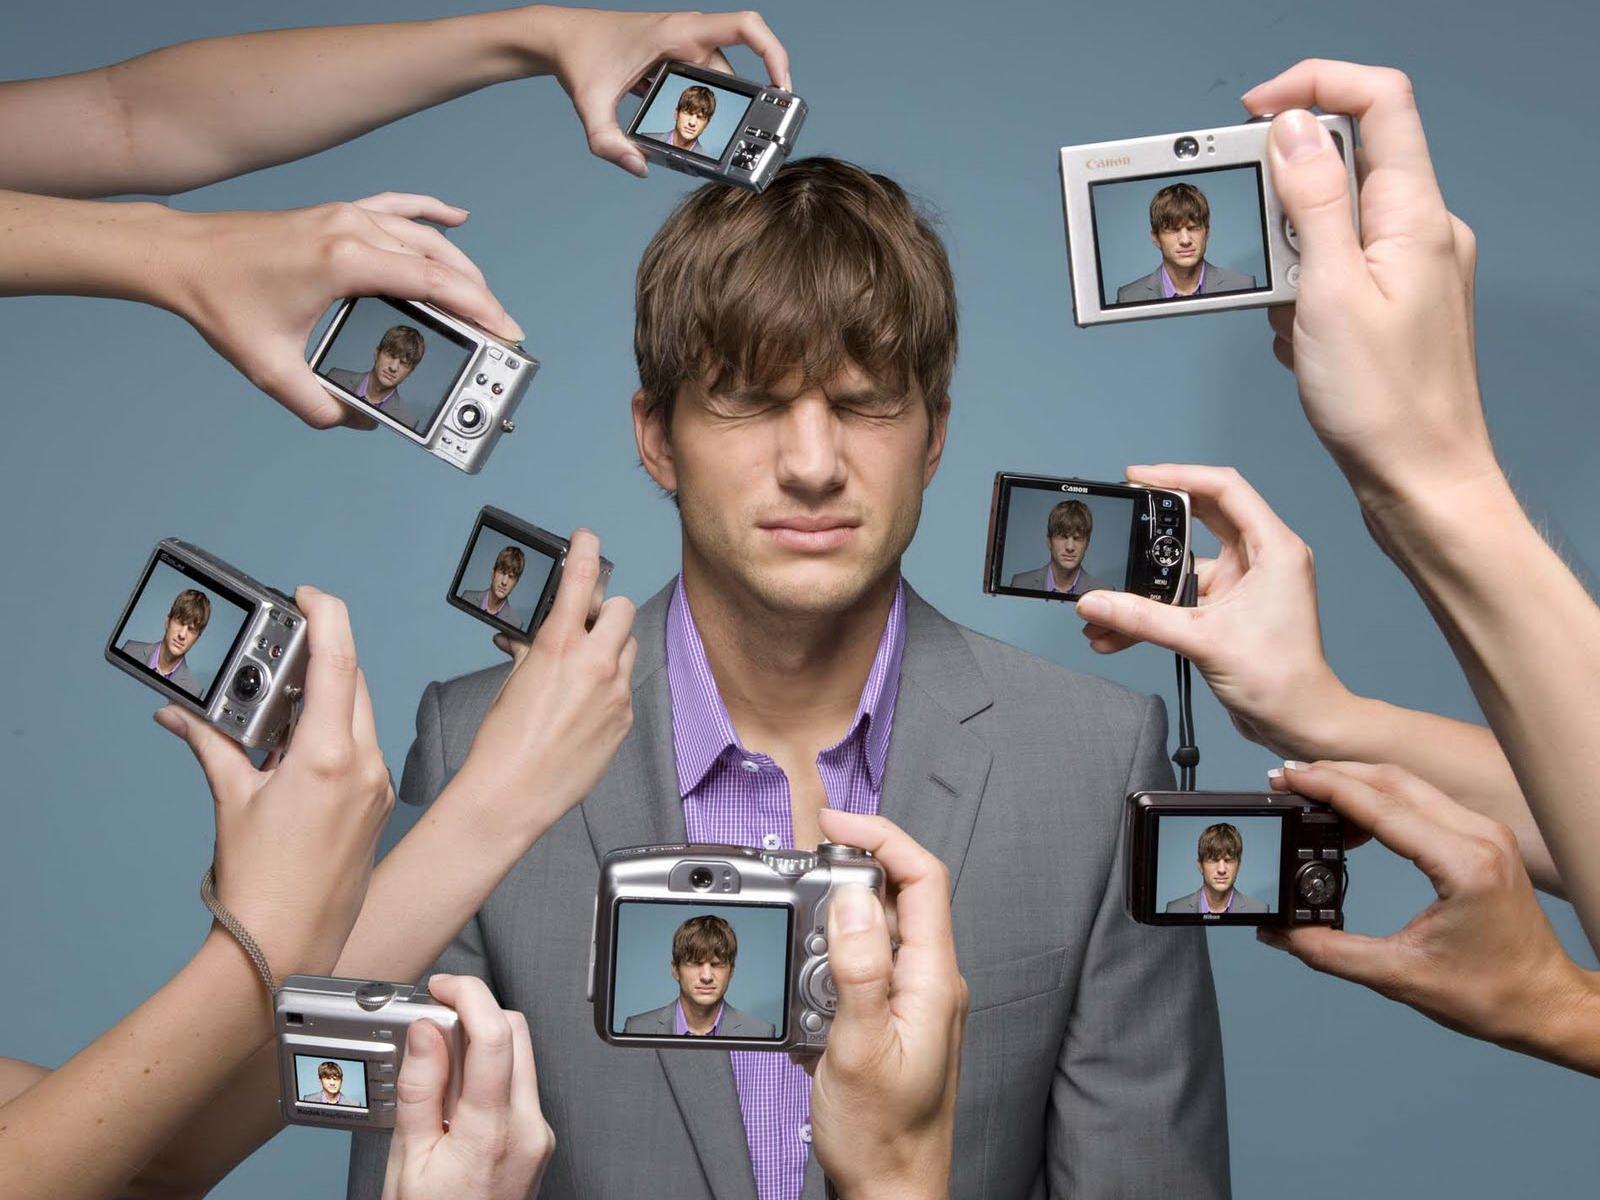 http://1.bp.blogspot.com/-51MaBLJ4hwk/UT8wLWJeMMI/AAAAAAAA2n0/qTx_-JbGe1I/s1600/ashton-kutcher-photoshoot.jpg